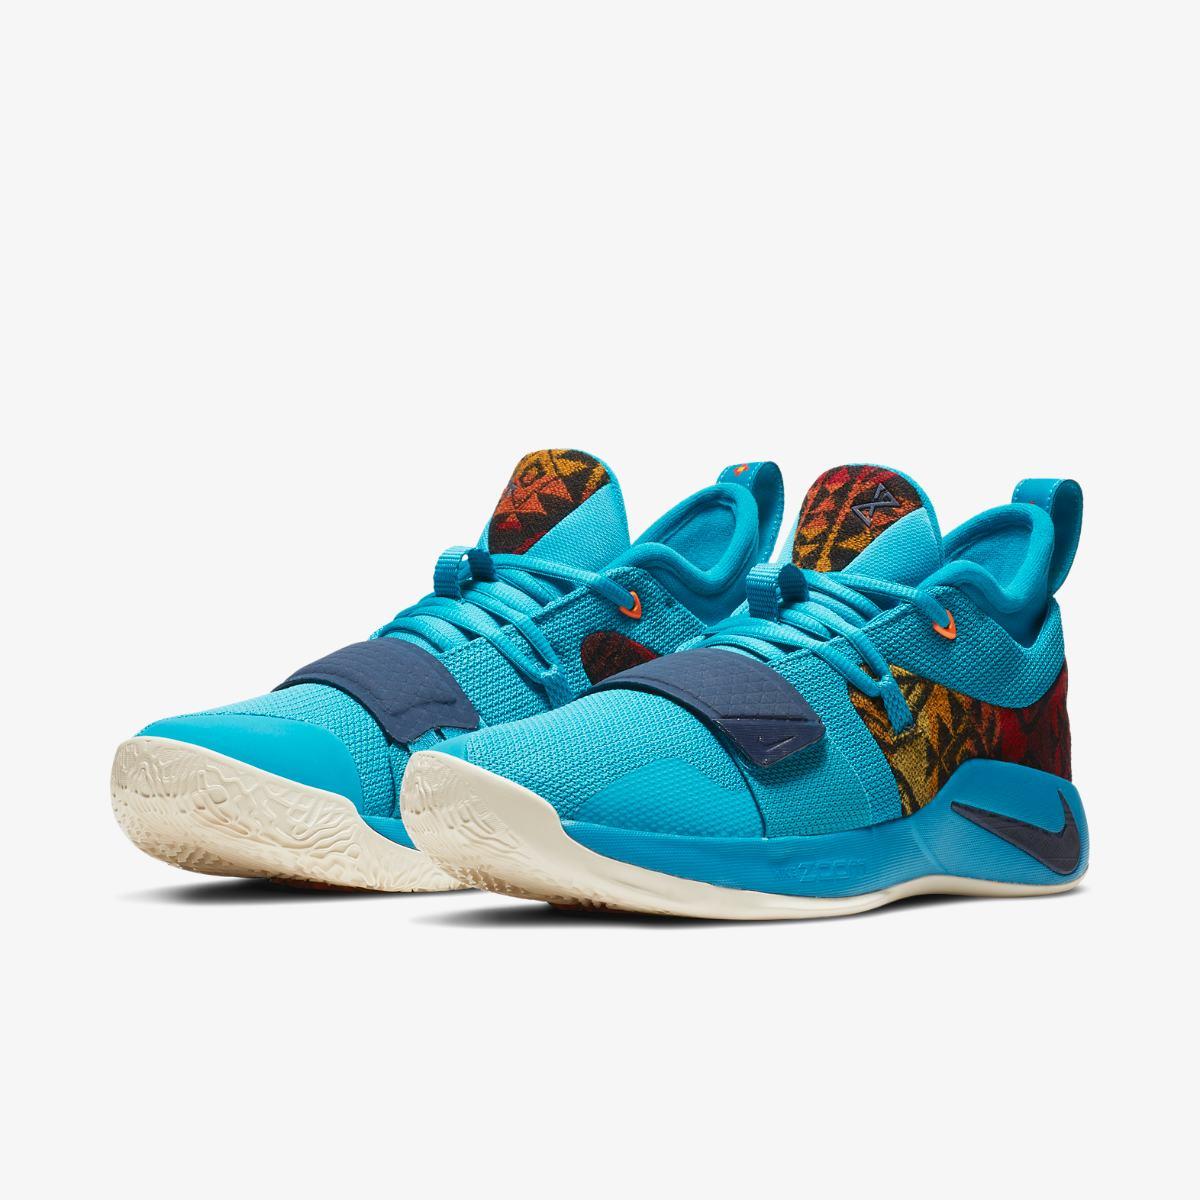 de8e3293 Кроссовки Nike PG 2.5 PENDLETON TV PE 2 CI0294-900 купить ...